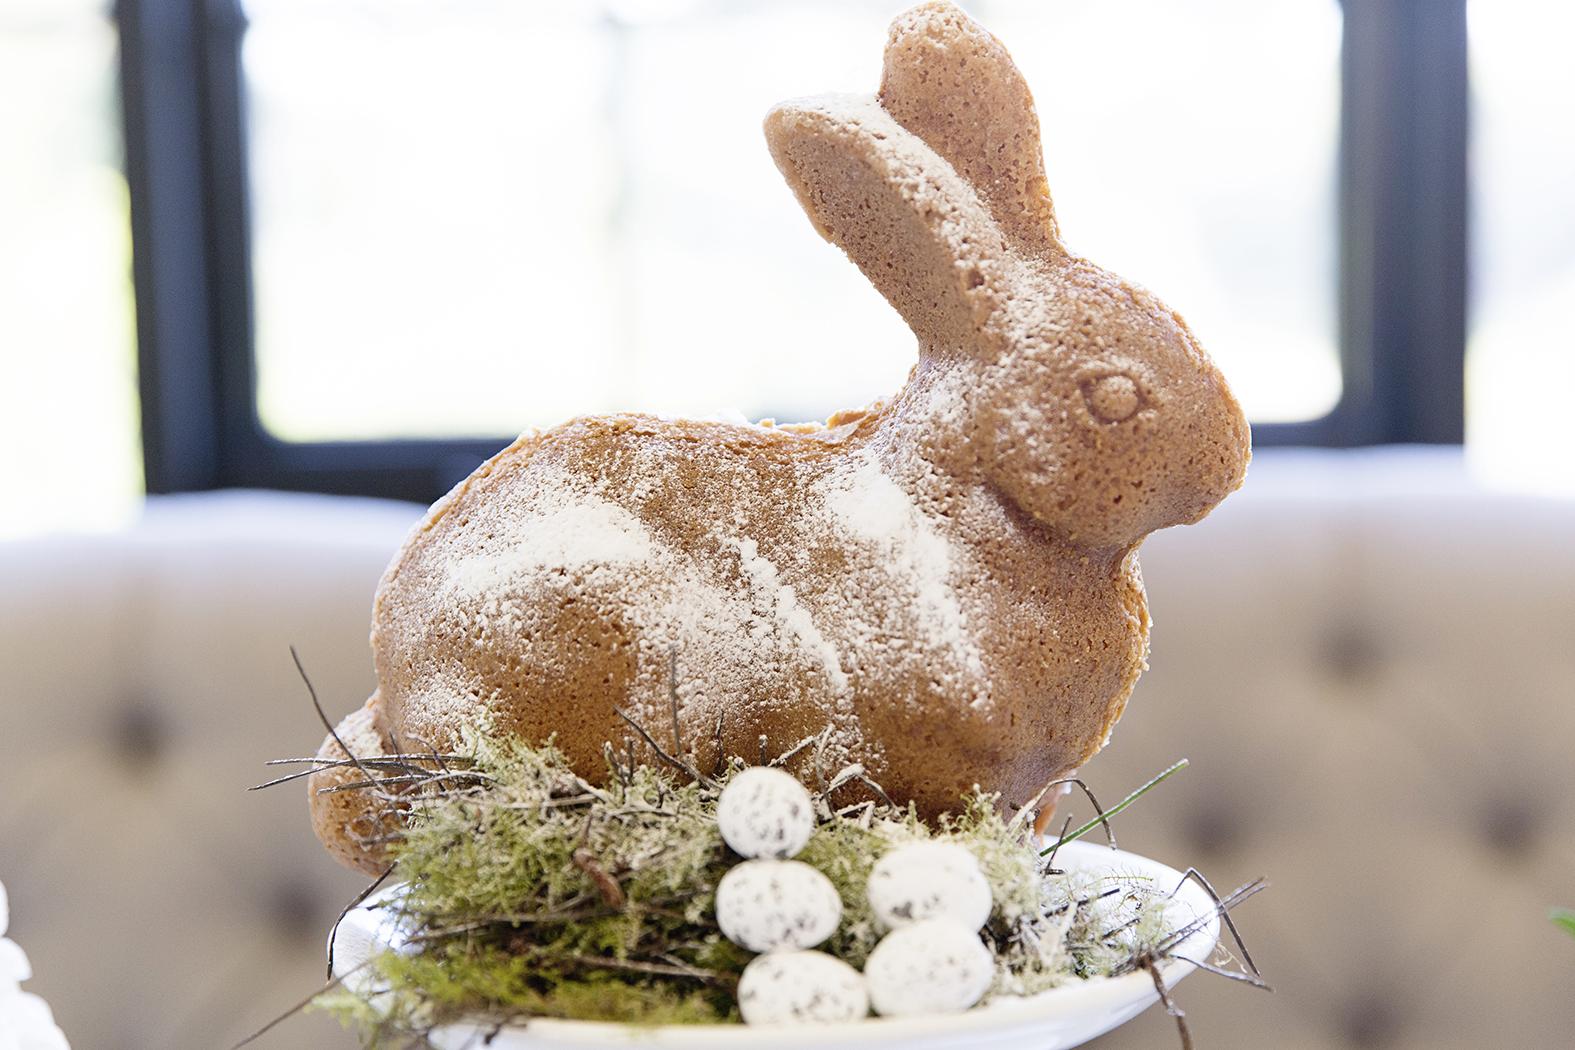 Rabbit Table 020 copy.jpg